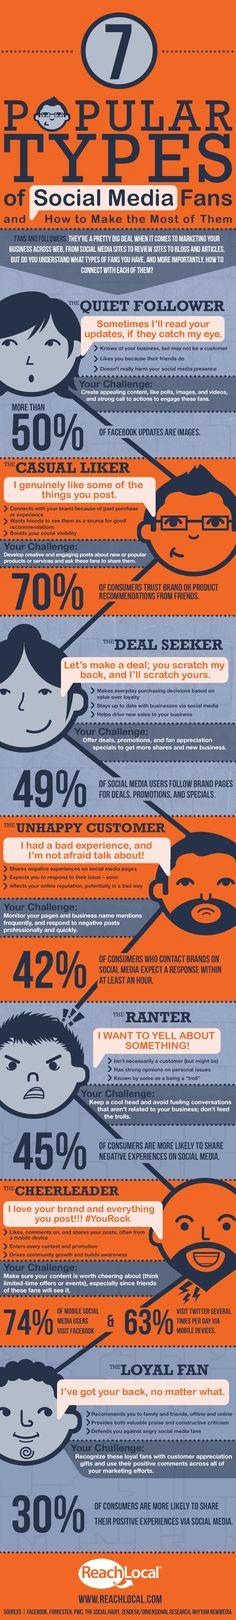 7 Popular Types of Social Media Fans [#Infographic]